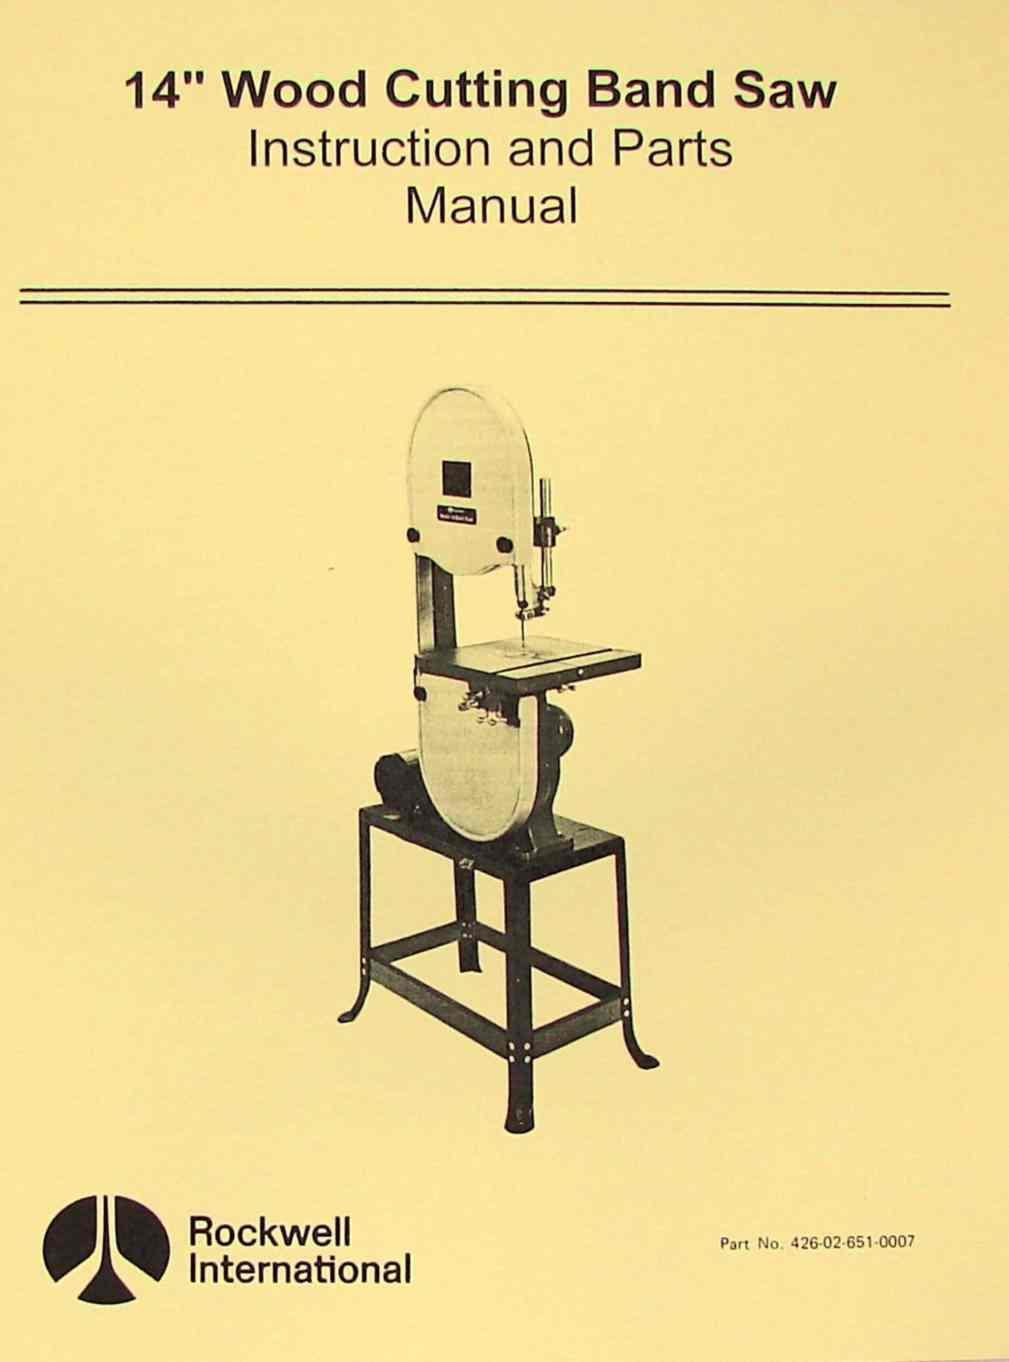 rockwell 14 wood band saw instruction parts manual ozark tool rh ozarktoolmanuals com Instruction Manual Book Instruction Manual Book